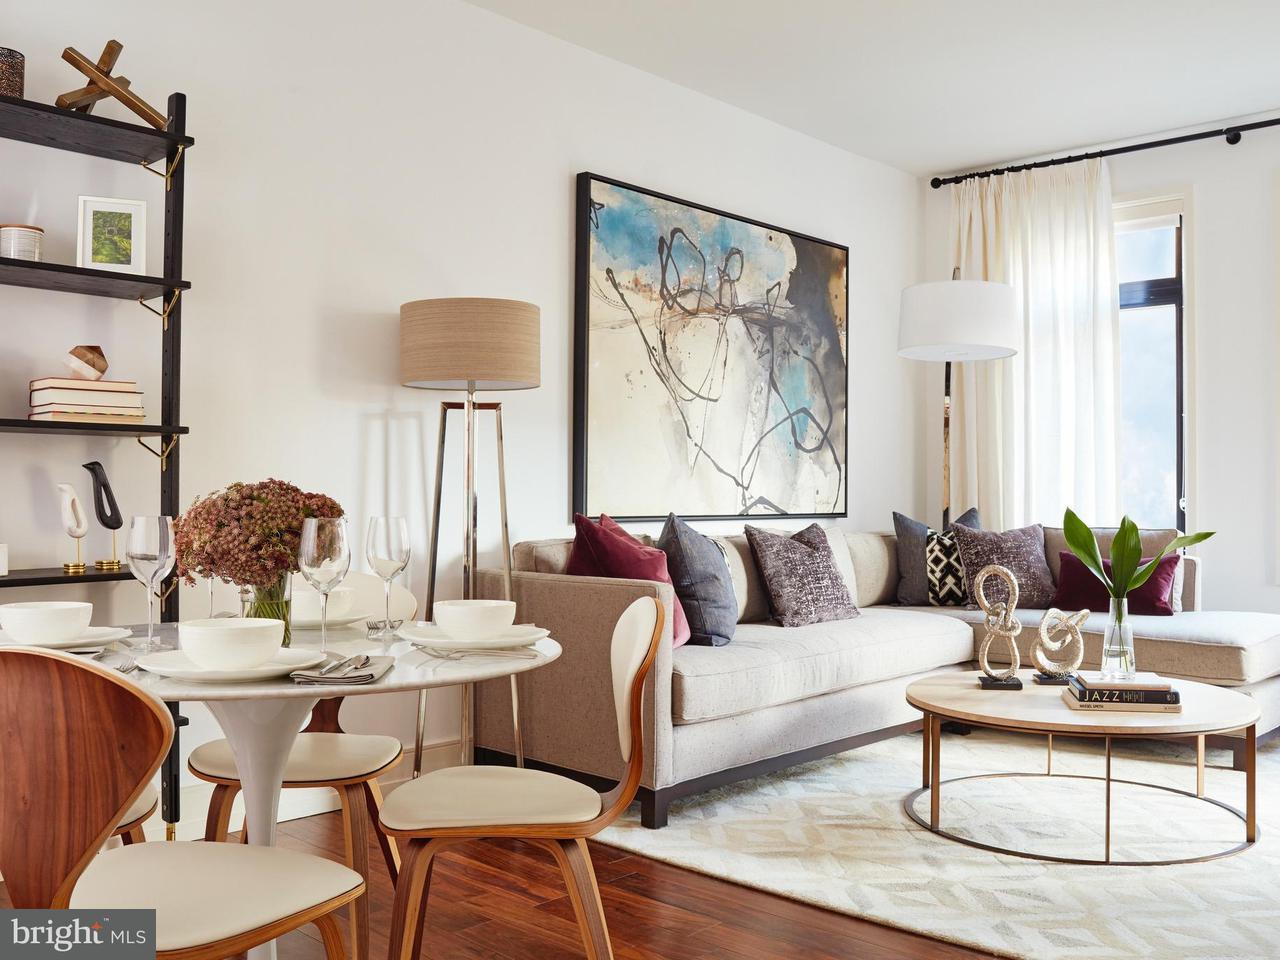 Condominium for Rent at 1310 U St NW #816 Washington, District Of Columbia 20009 United States